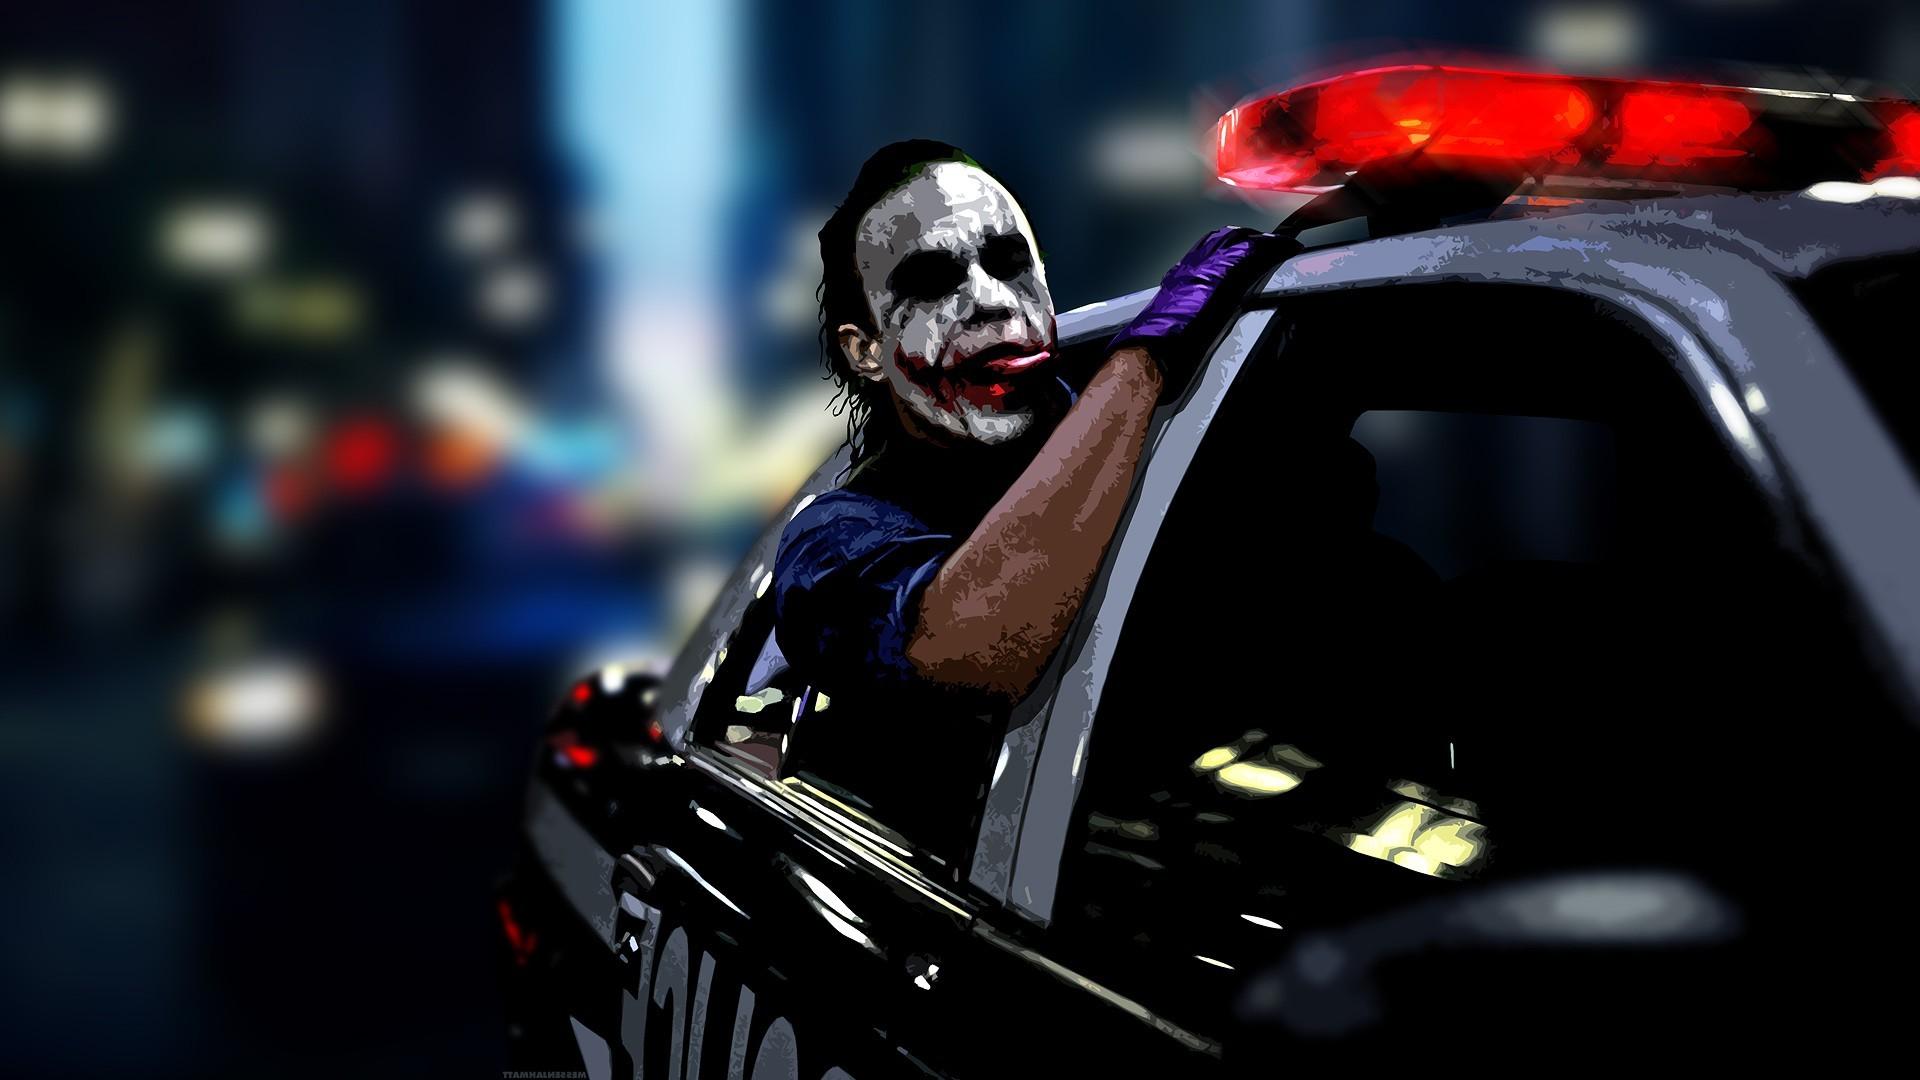 Heath Ledger Joker HD Wallpaper ID × Heath Ledger Joker